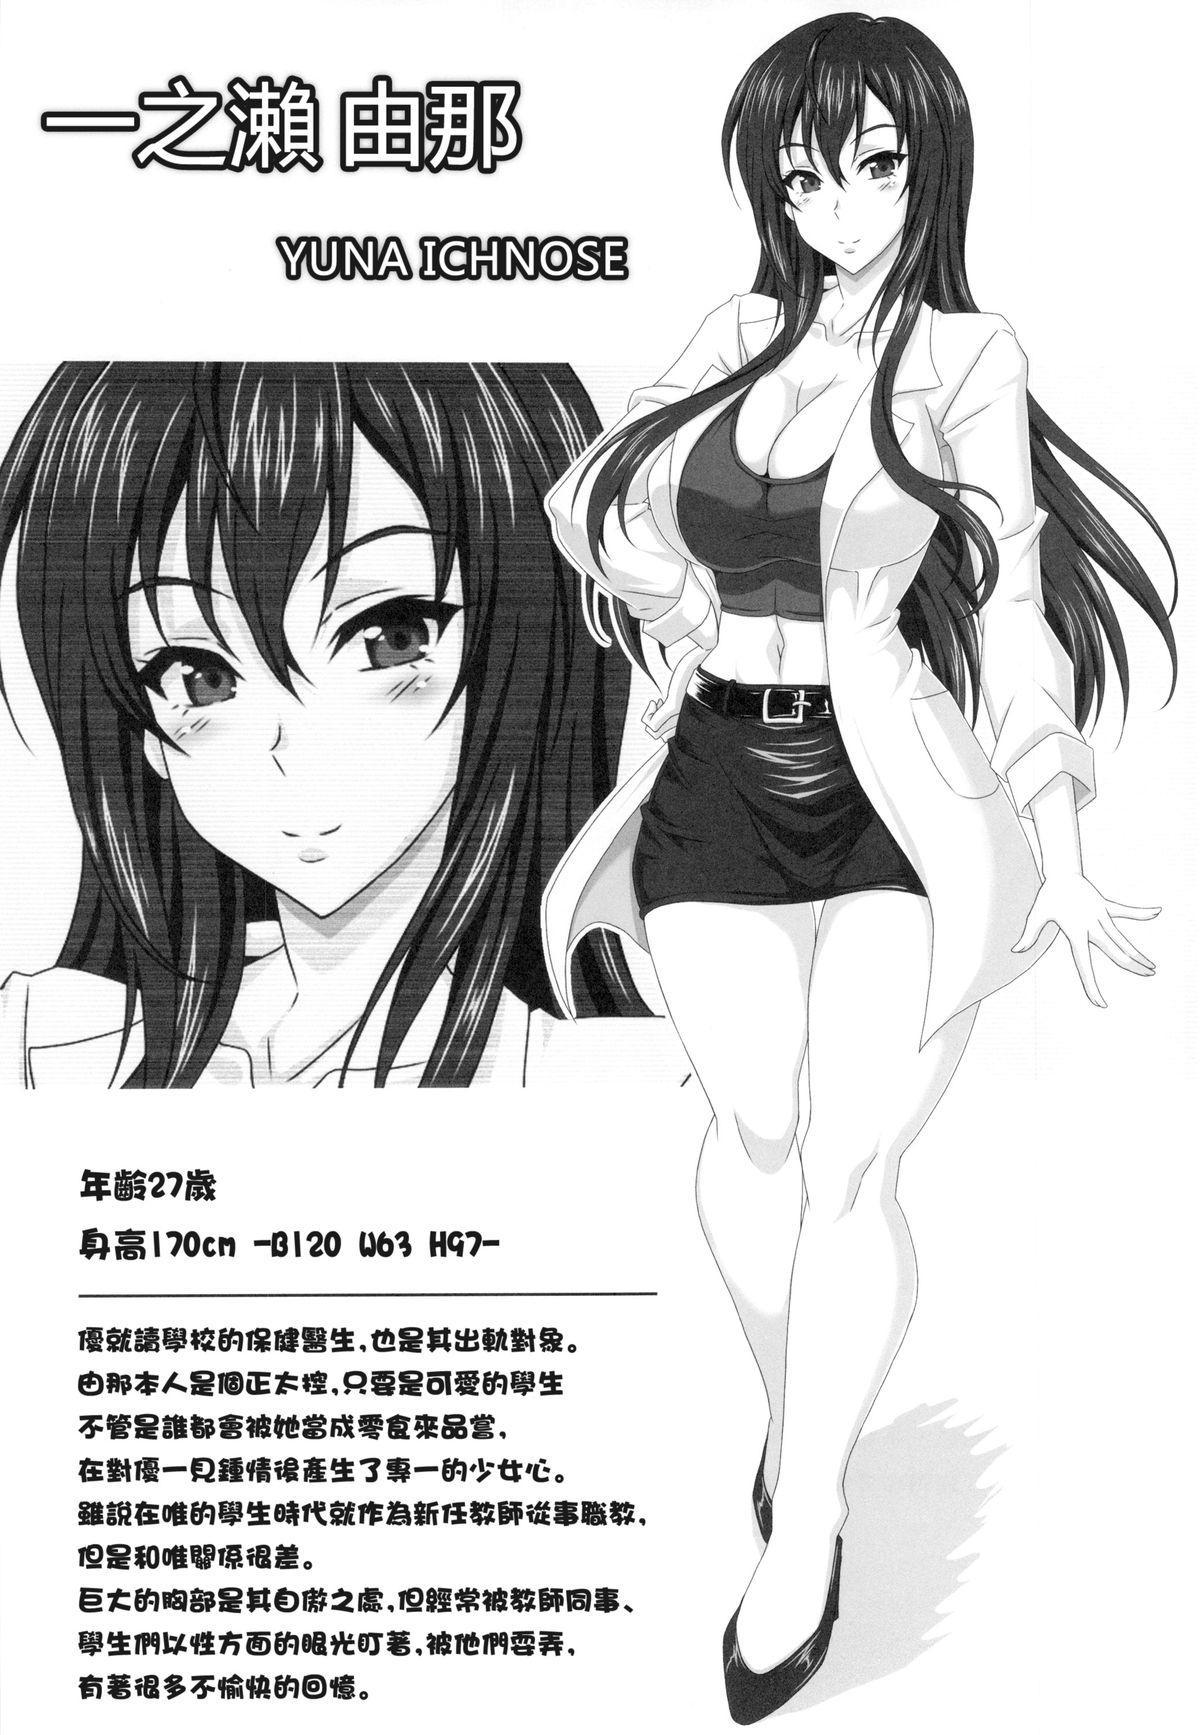 (COMIC1☆7) [KEN] Boku dake no Bakunyuu Onamaid -7 Shuunen- | My Very Own Big Titted Fucktoy Maid -7th Anniversay- (Boku Dake no Bakunyuu Onamaid -7 Shuunen Kinen Goudoushi-) [English] 3